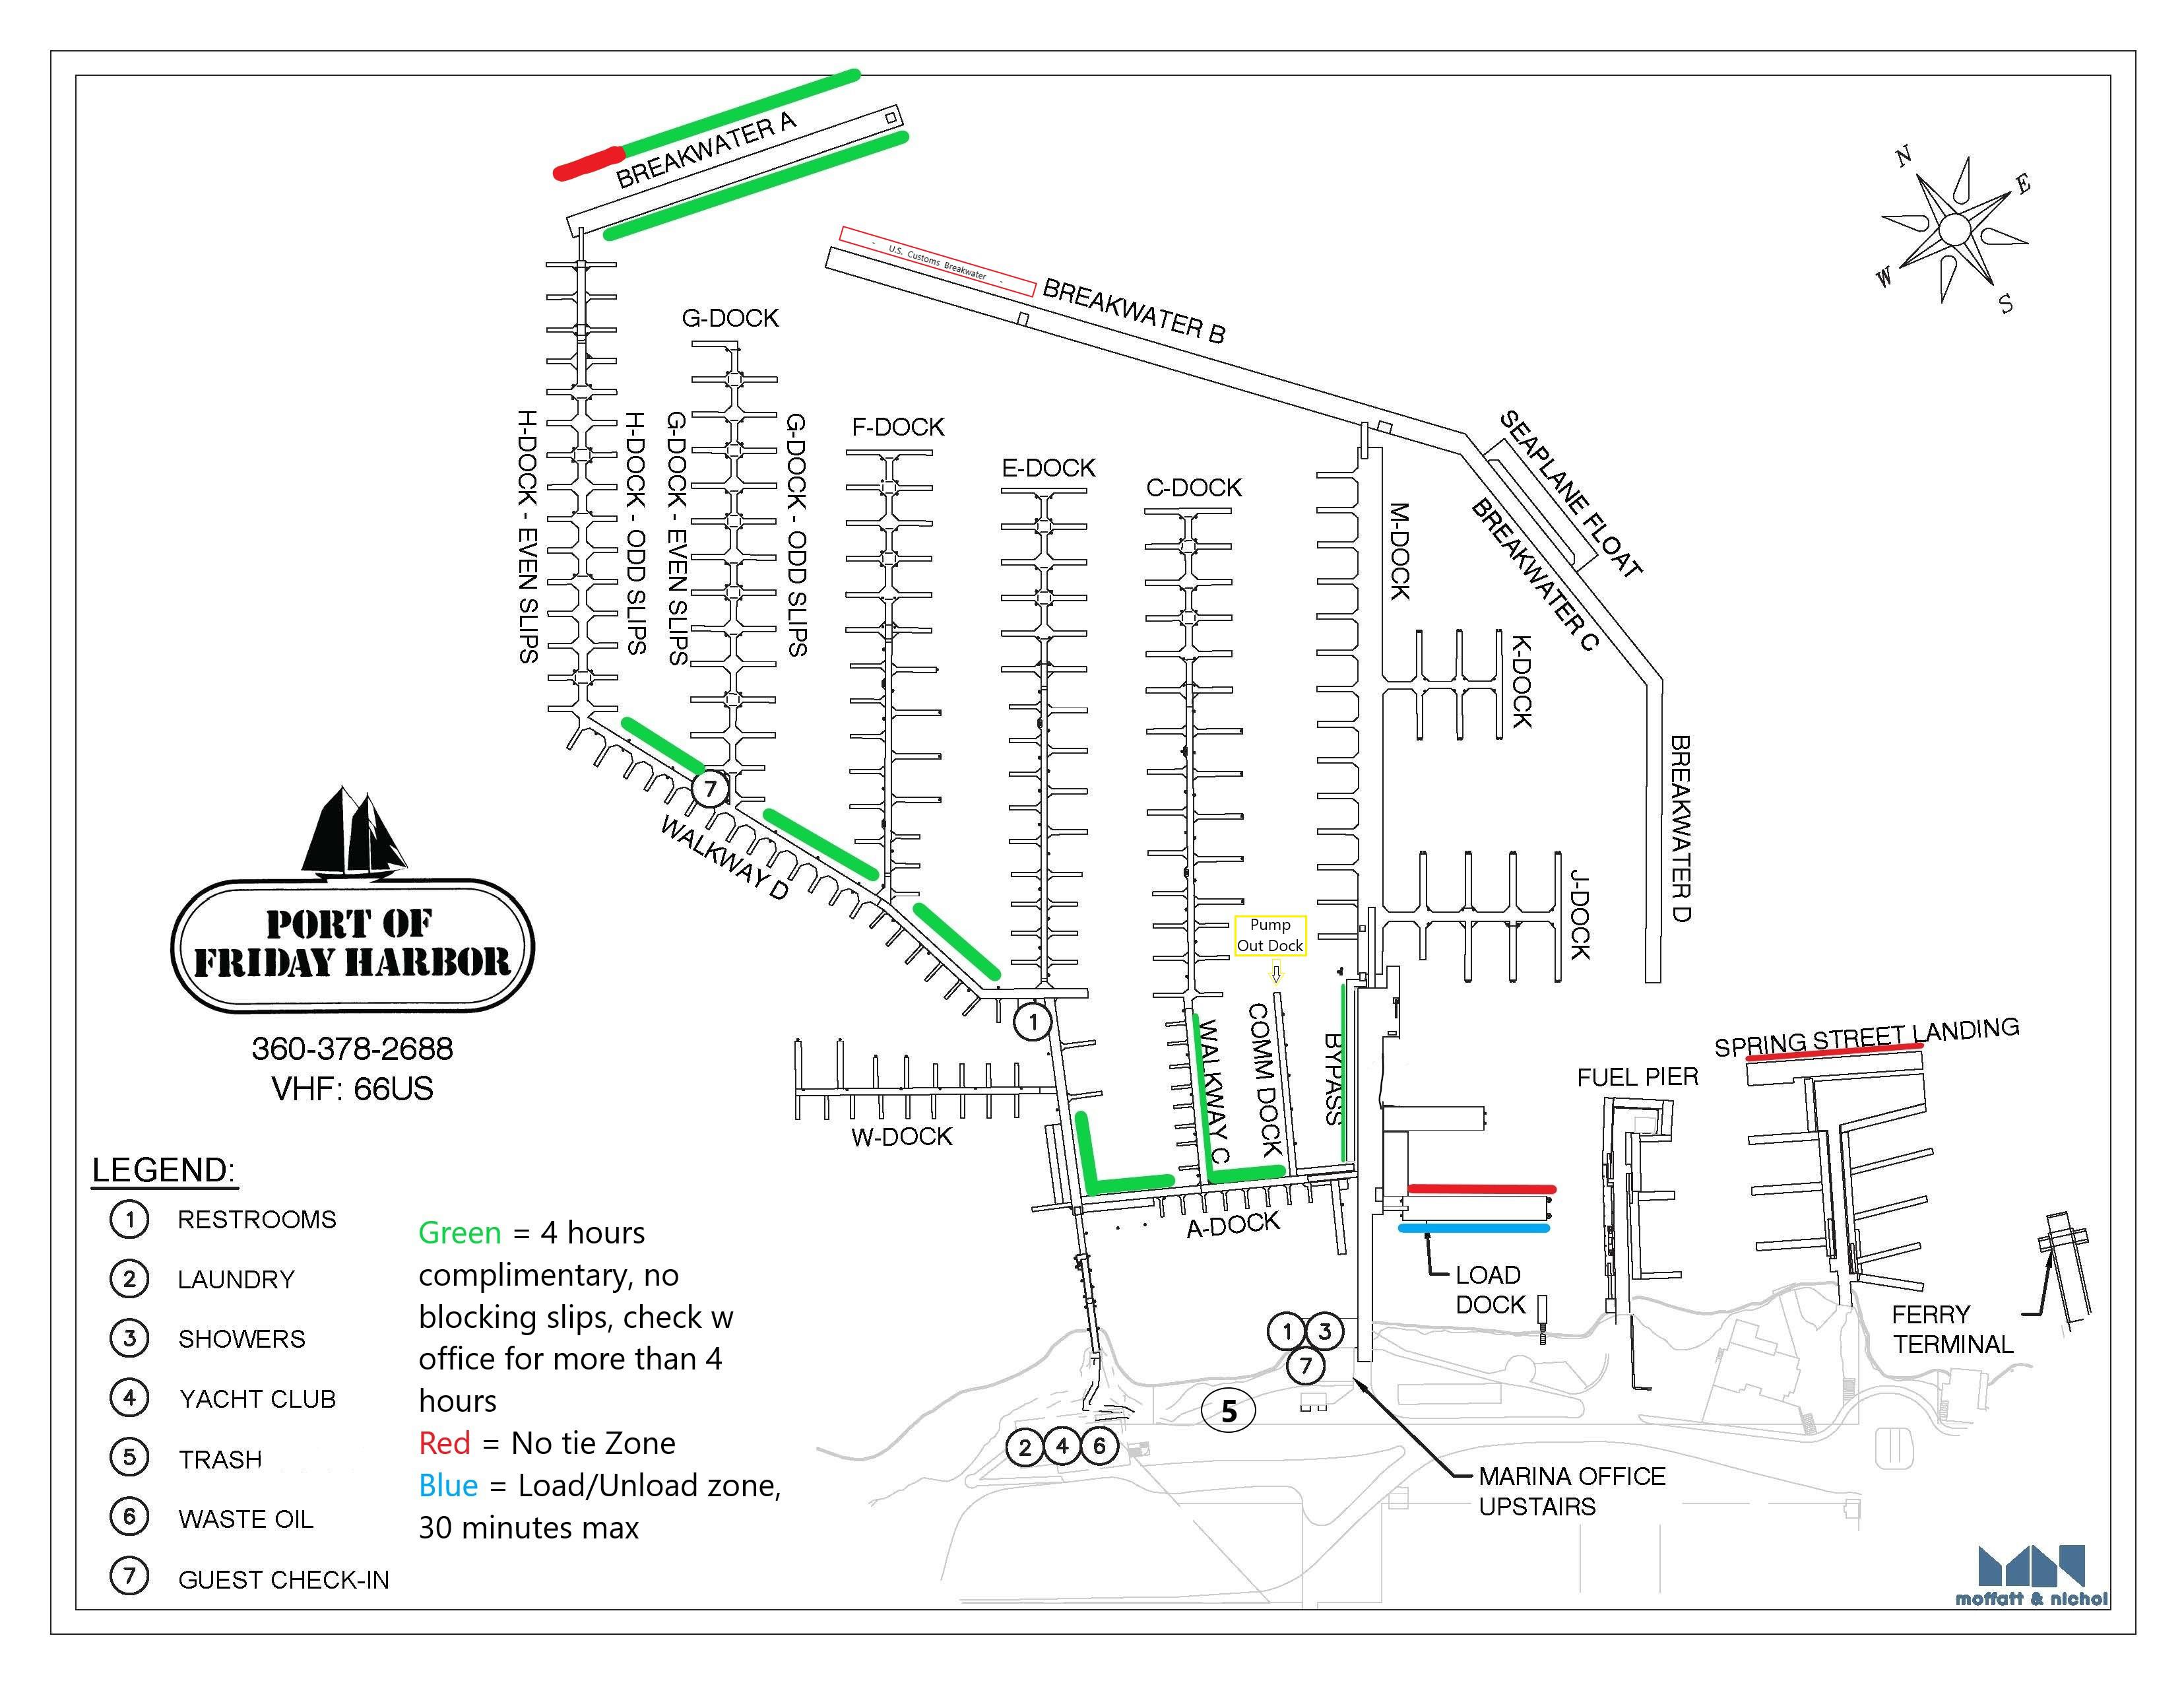 Marina Map – The Port of Friday Harbor on paris charles de gaulle map, frankfurt international arrivals map, hospital map, crash landing map, heathrow map, restaurant map, airline map, reds map, klia2 vs klia map, hotel map, world map, travel flight map, cape town south africa map, tech center map,